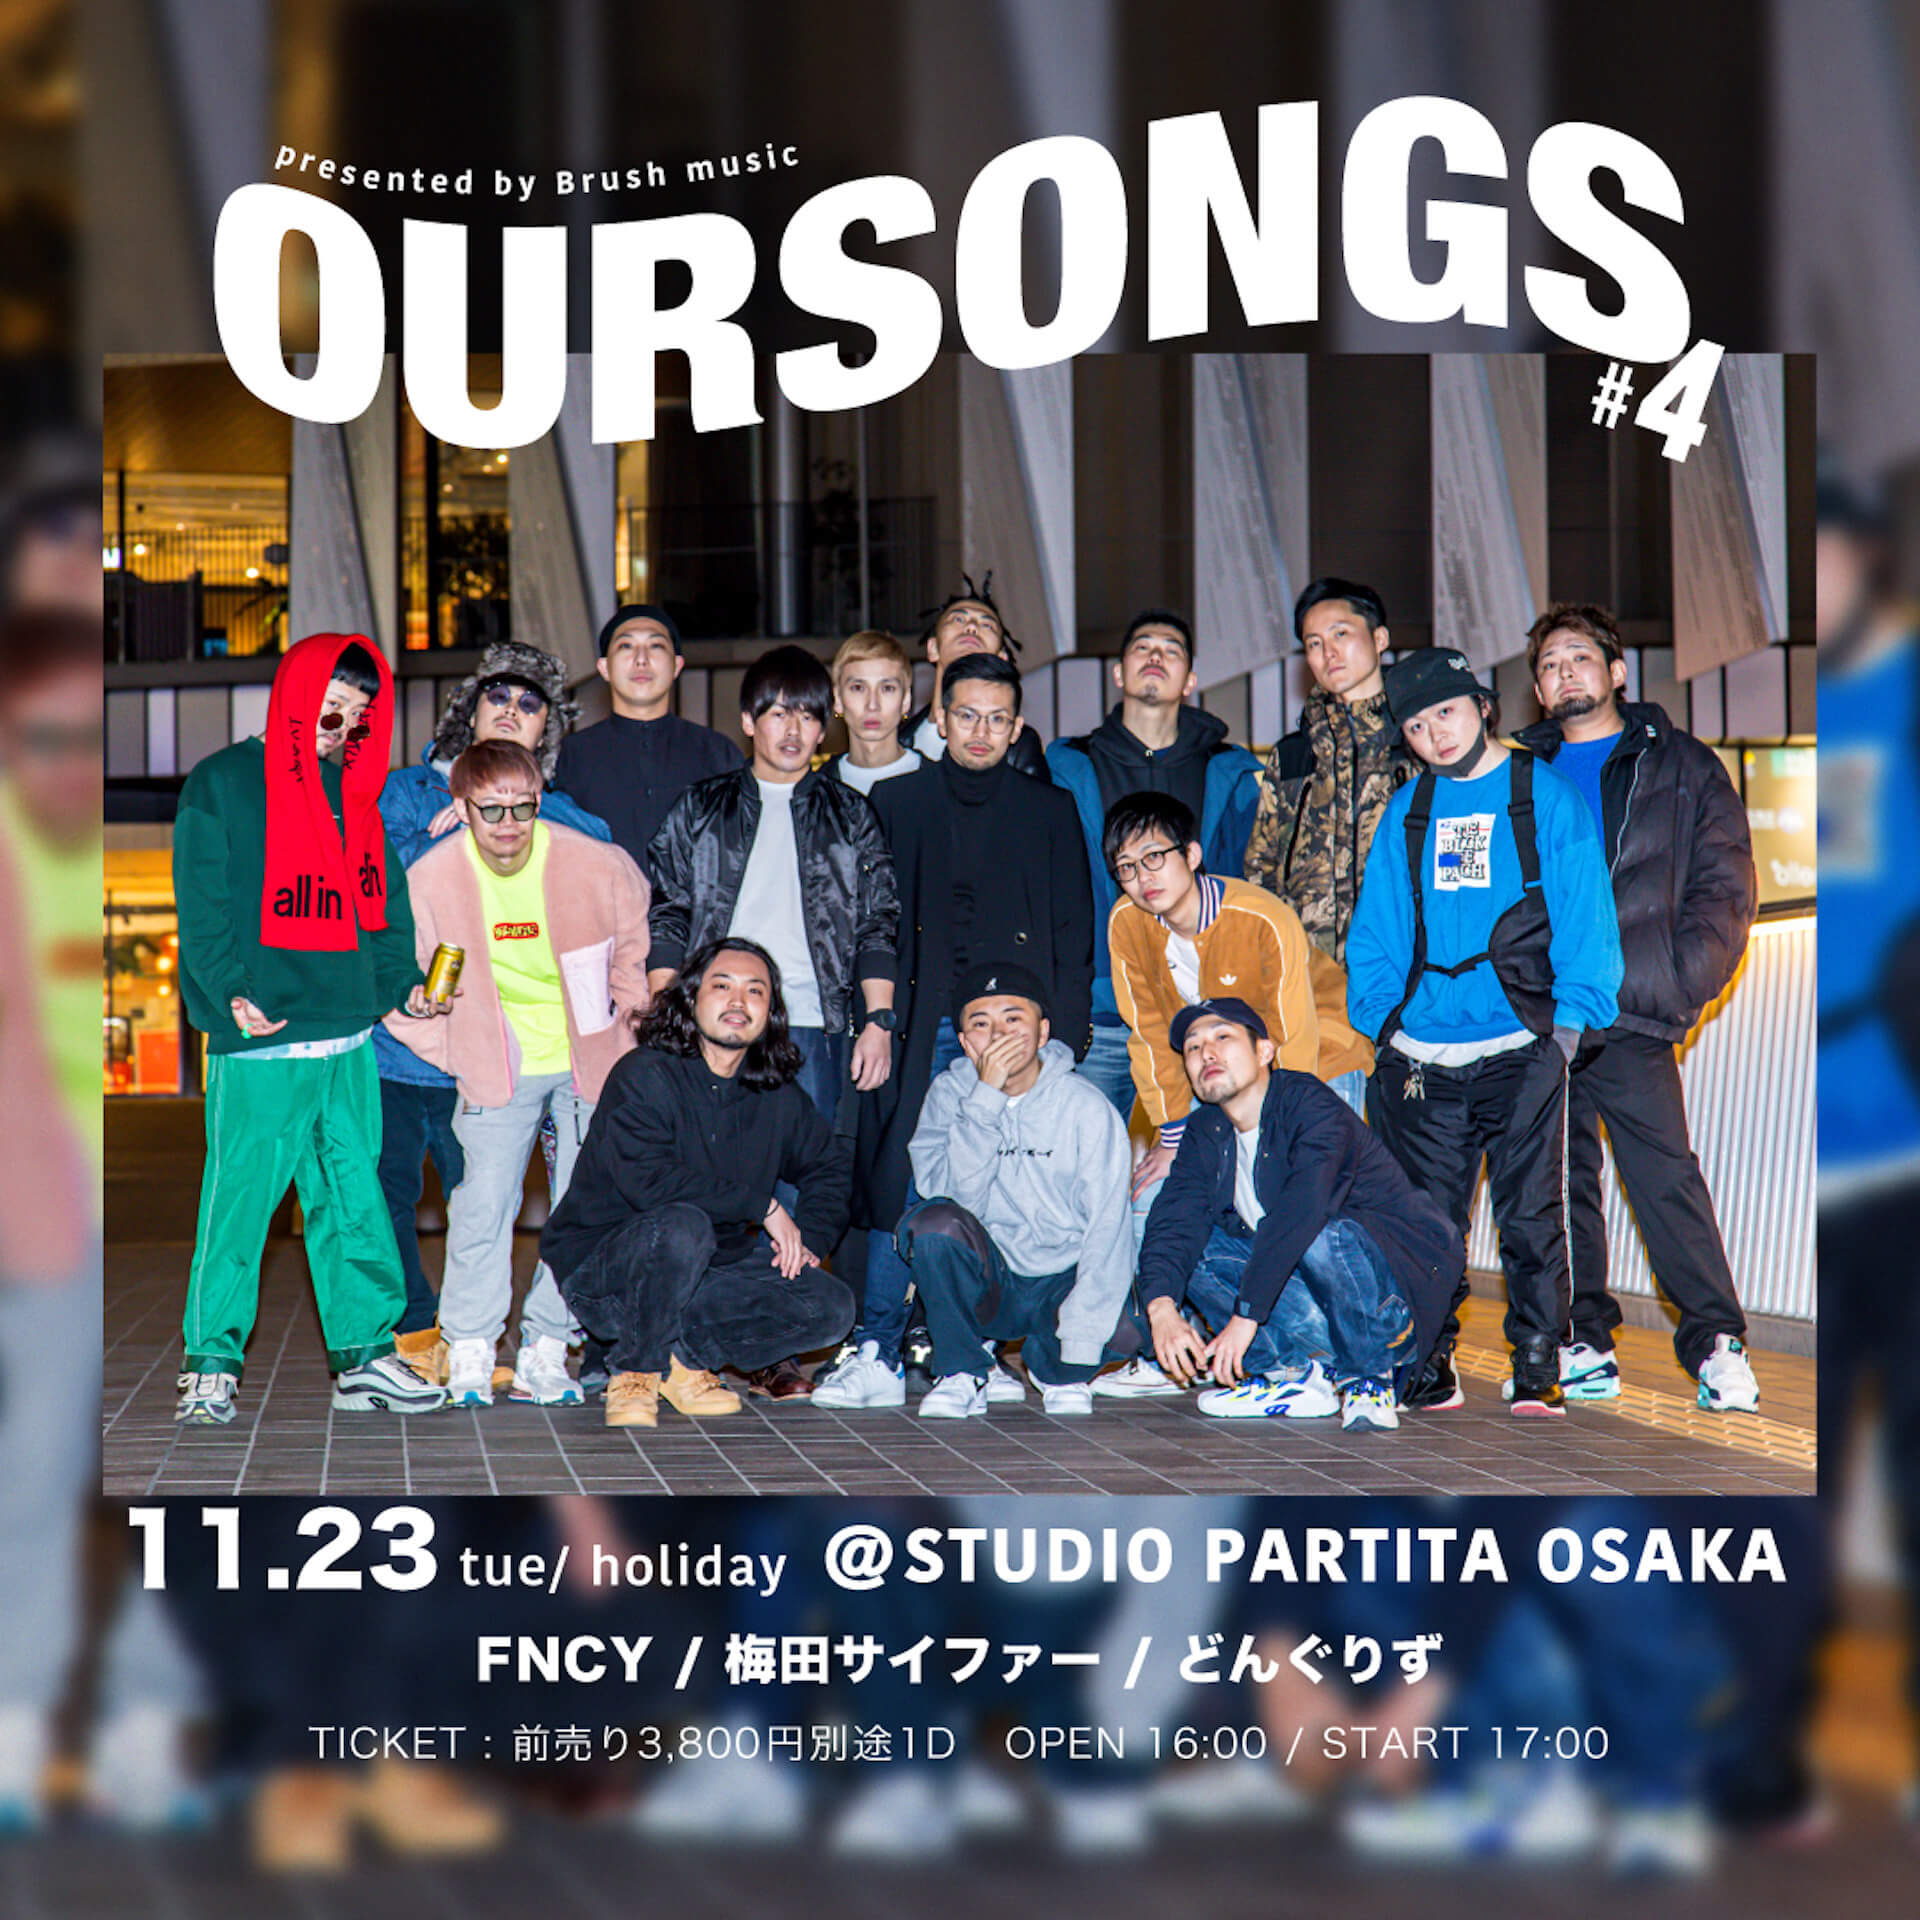 <OURSONGS #4>が大阪名村造船所跡地にて開催が決定!梅田サイファー、FNCY、どんぐりずによるスリーマン music211012_oursongs_02